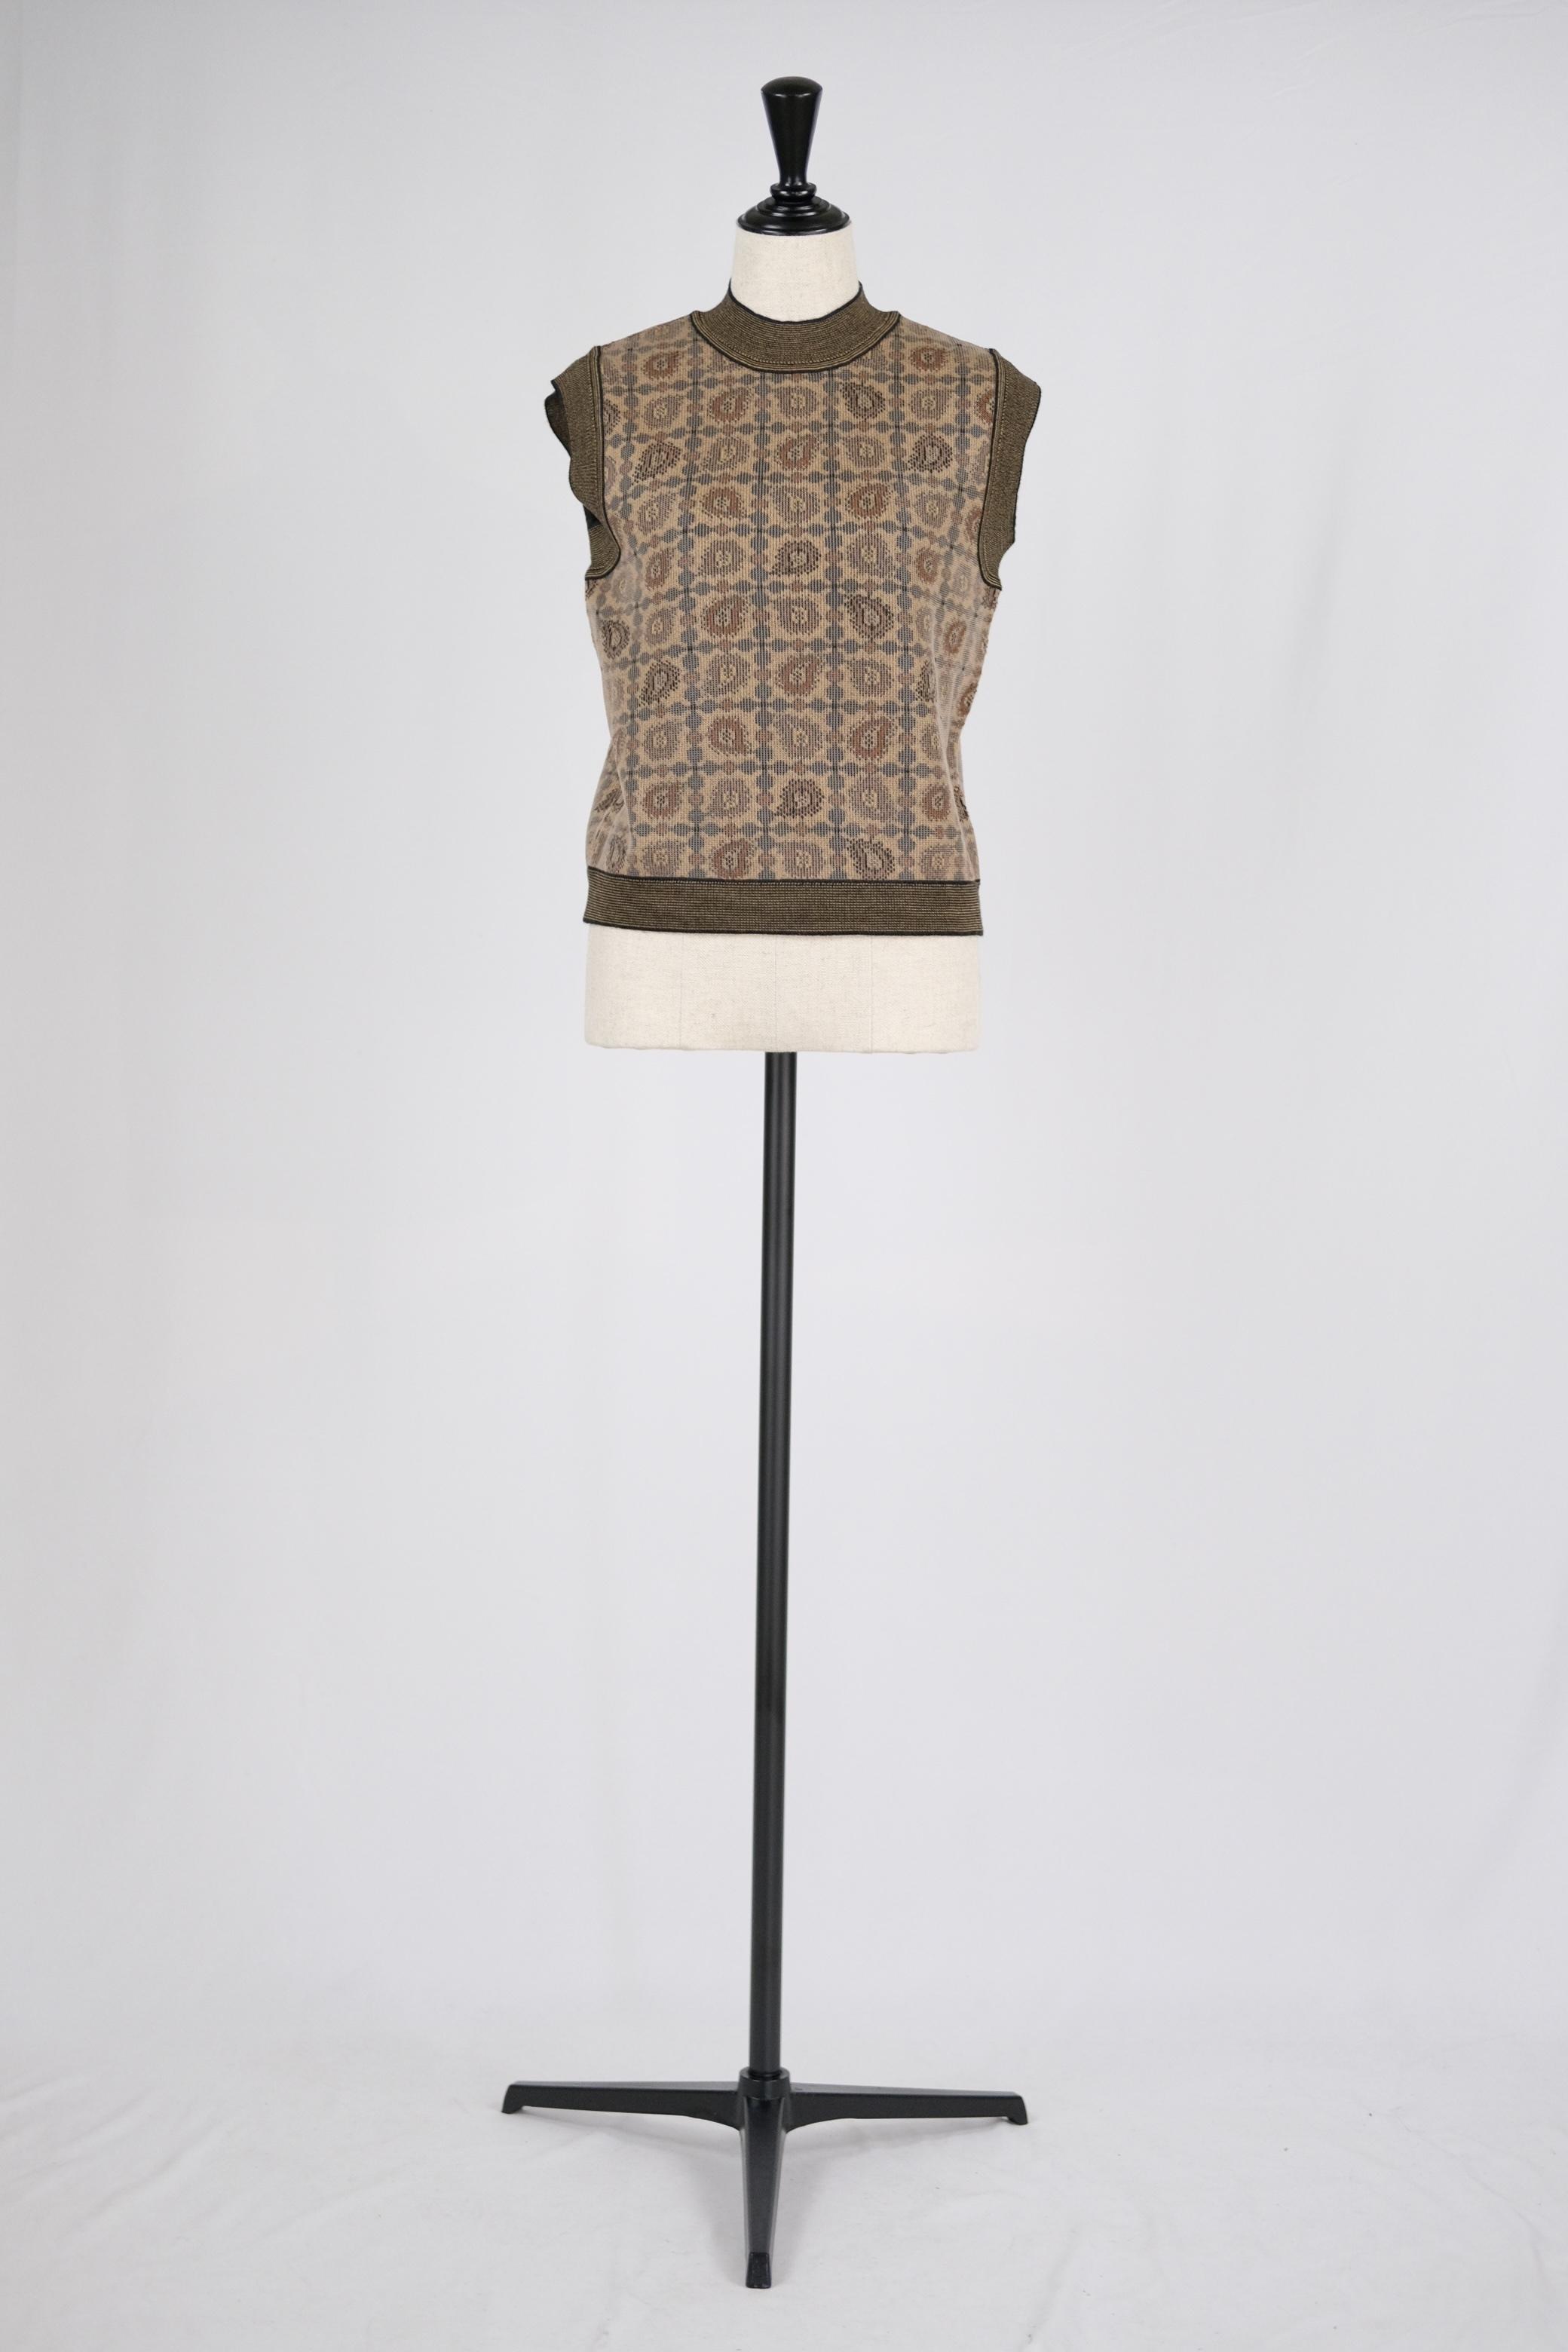 【Mame Kurogouchi】Paisley Jacquard Knitted Vest - brown